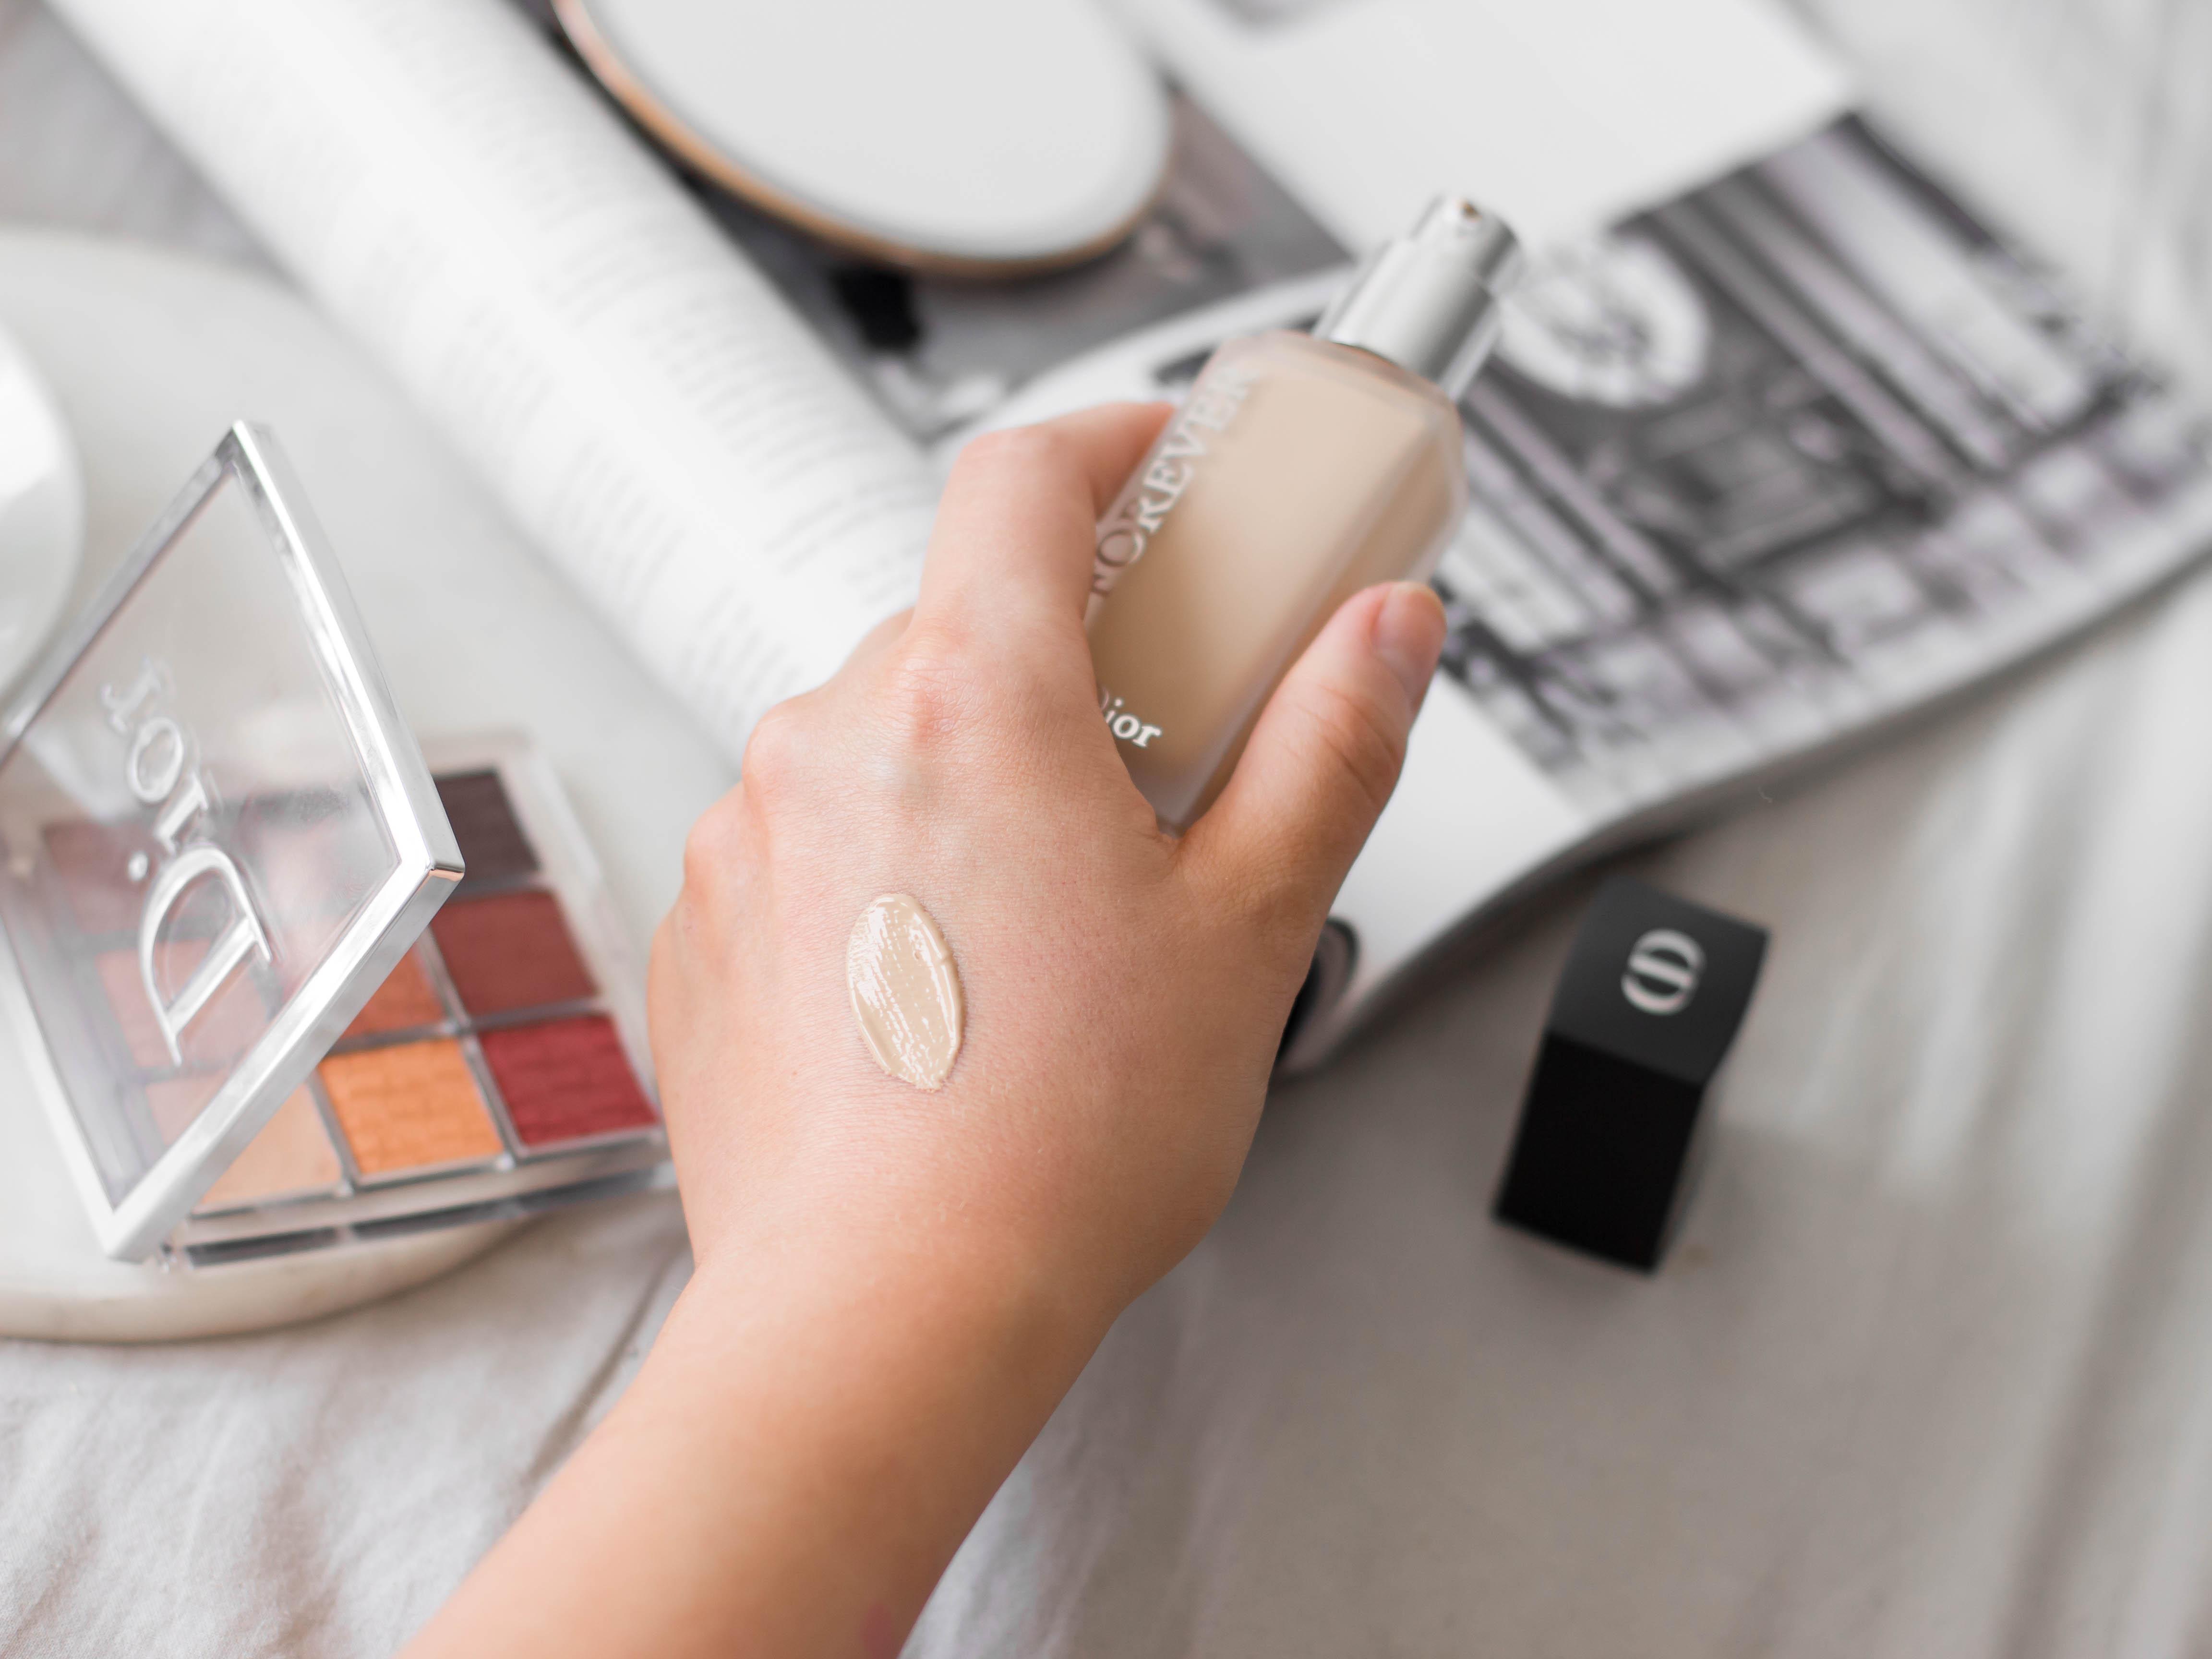 dior forever matte makeup swatche